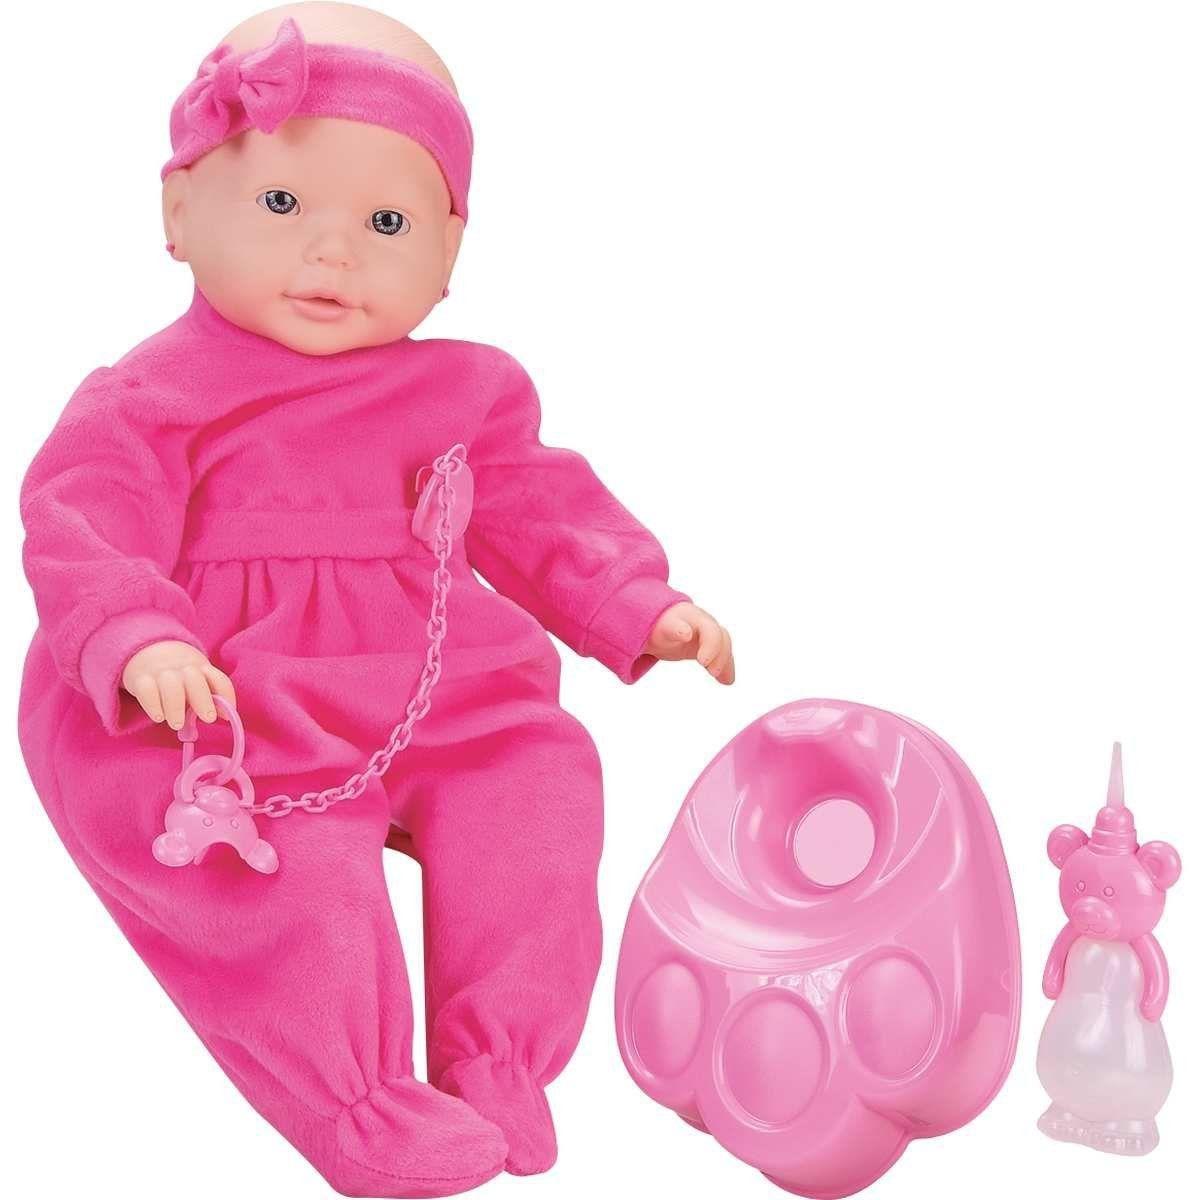 Boneca Bebê Mania Xixi - Macaquinho Rosa - Roma Jensen